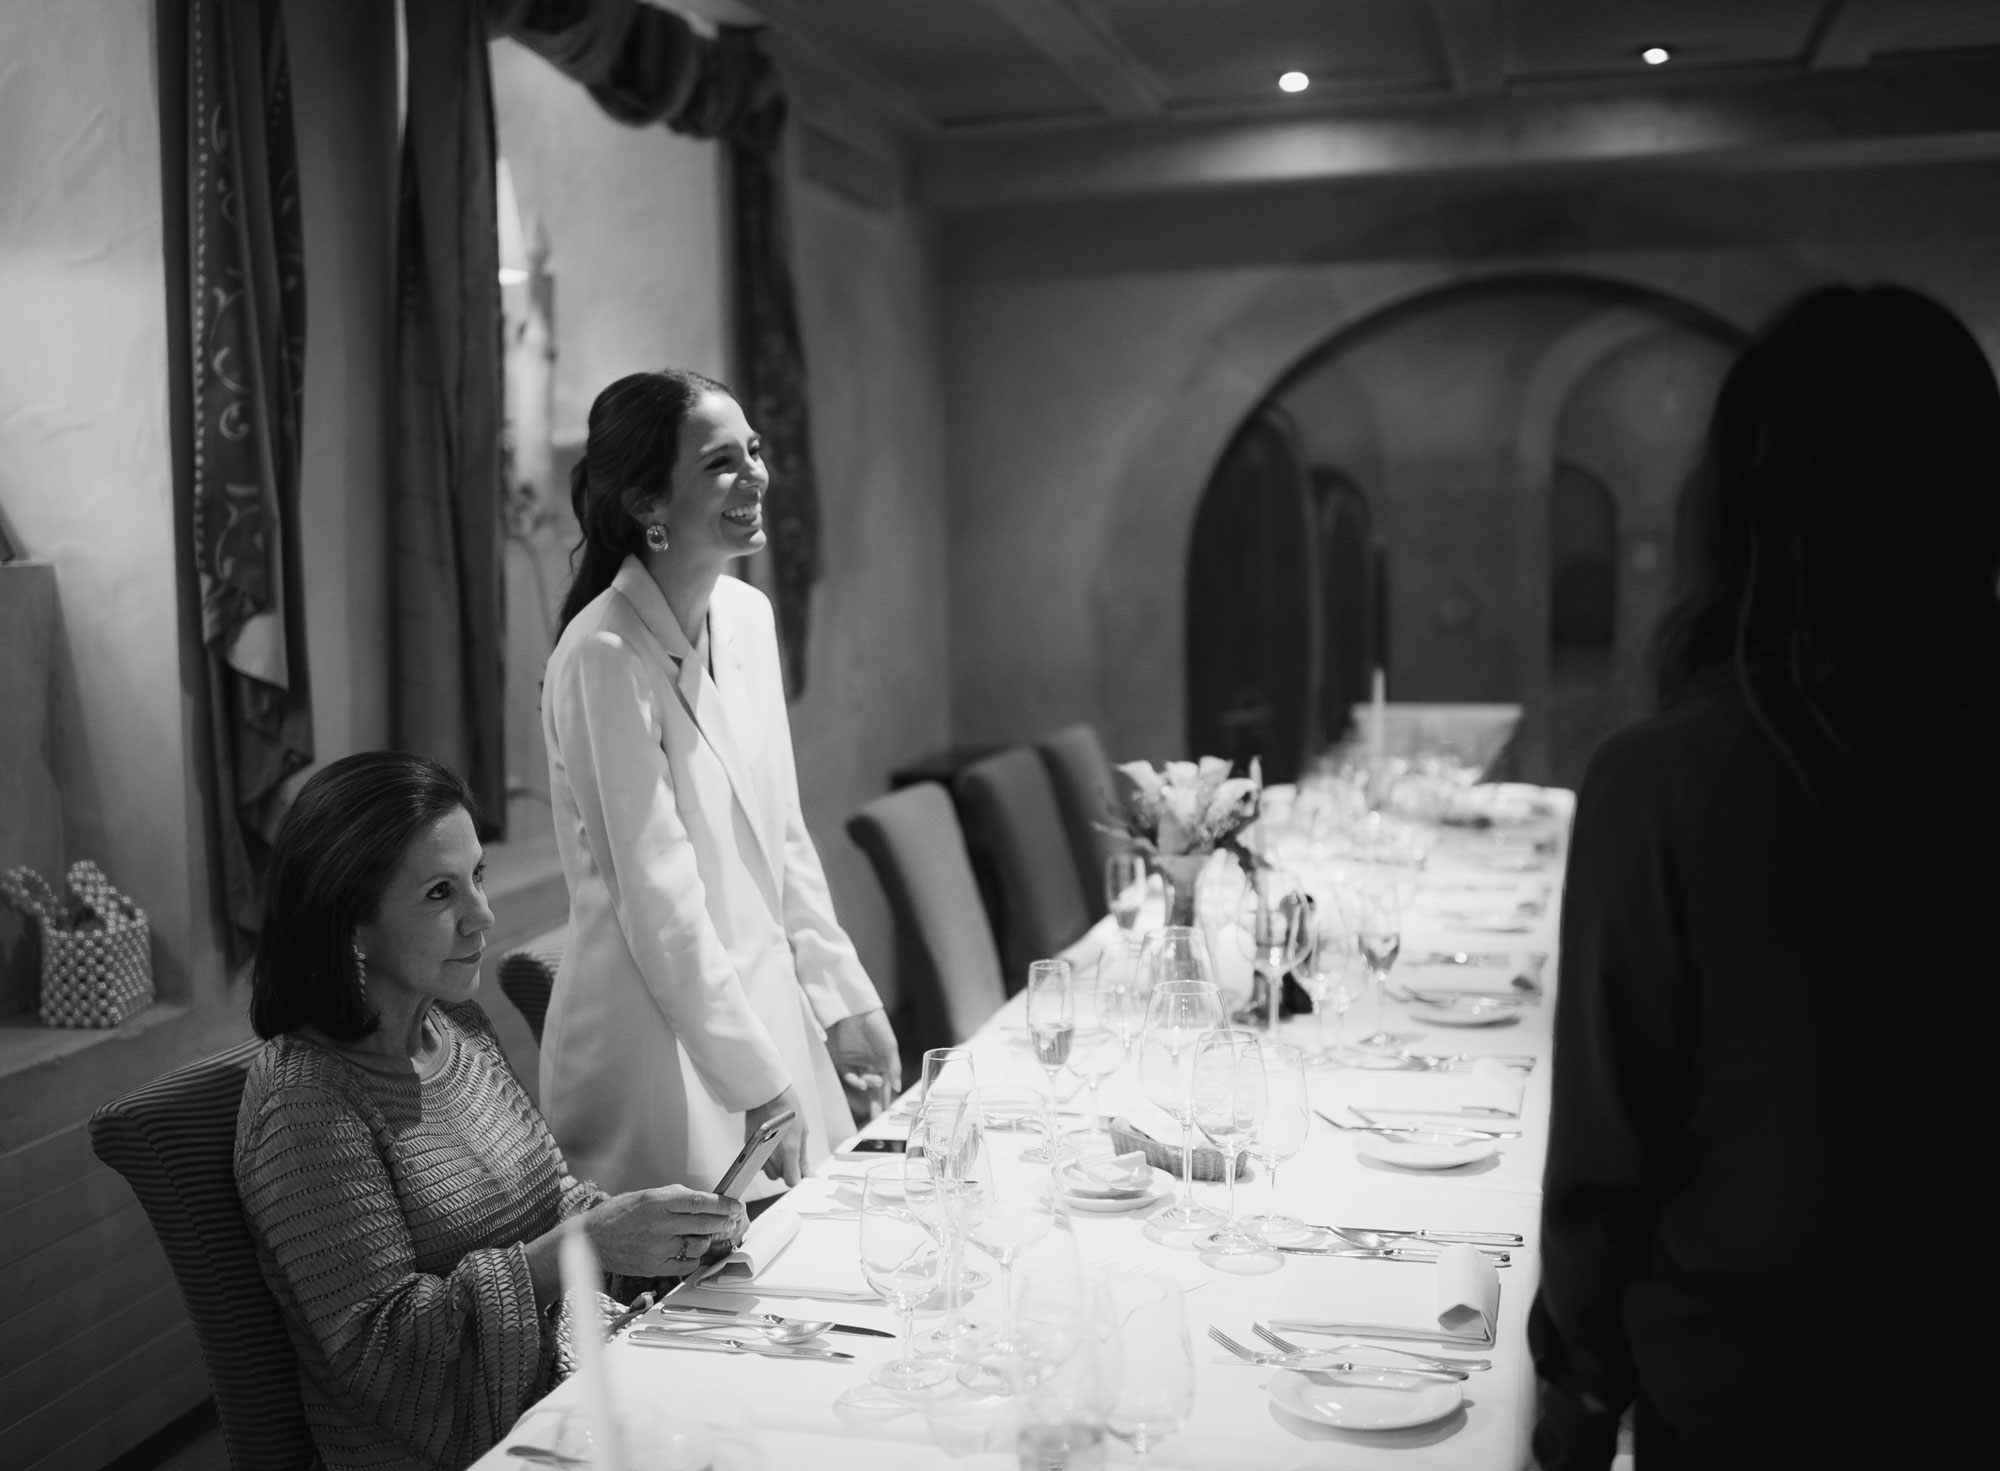 juliana-cosimo-stadthaus-wedding-13.jpg